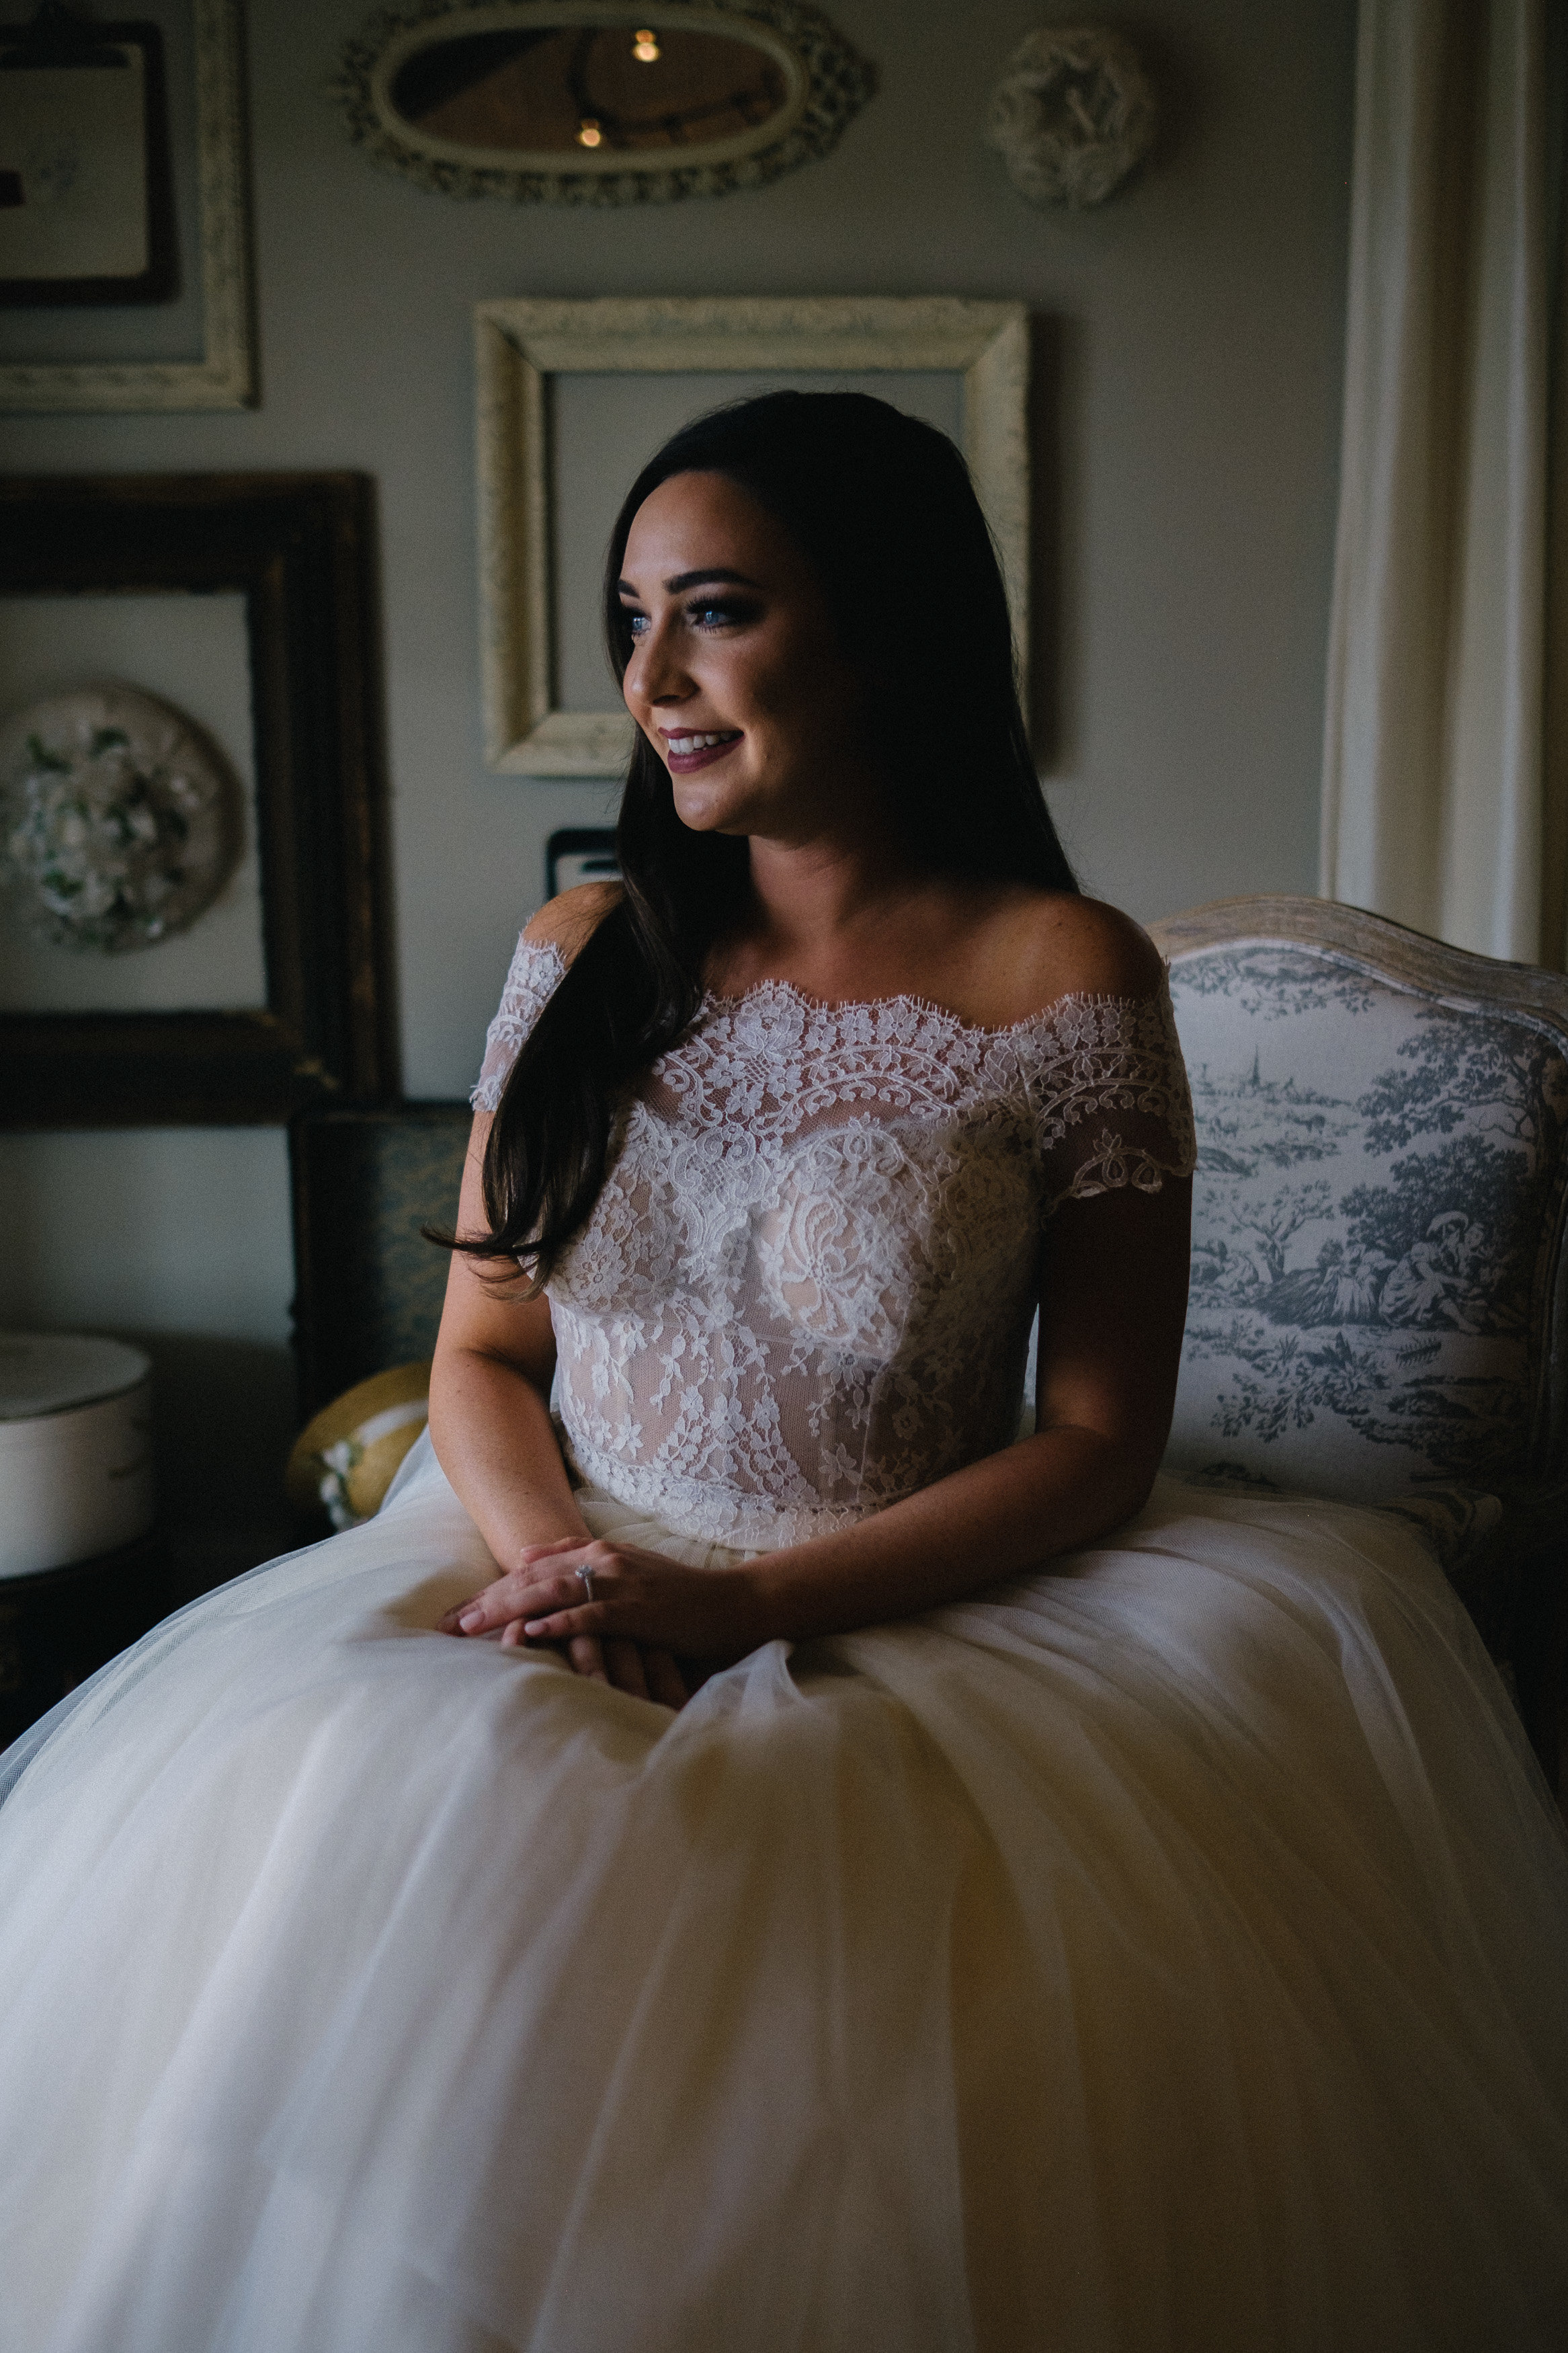 Nashville_Wedding_Photography_Mint_Springs_16.jpg